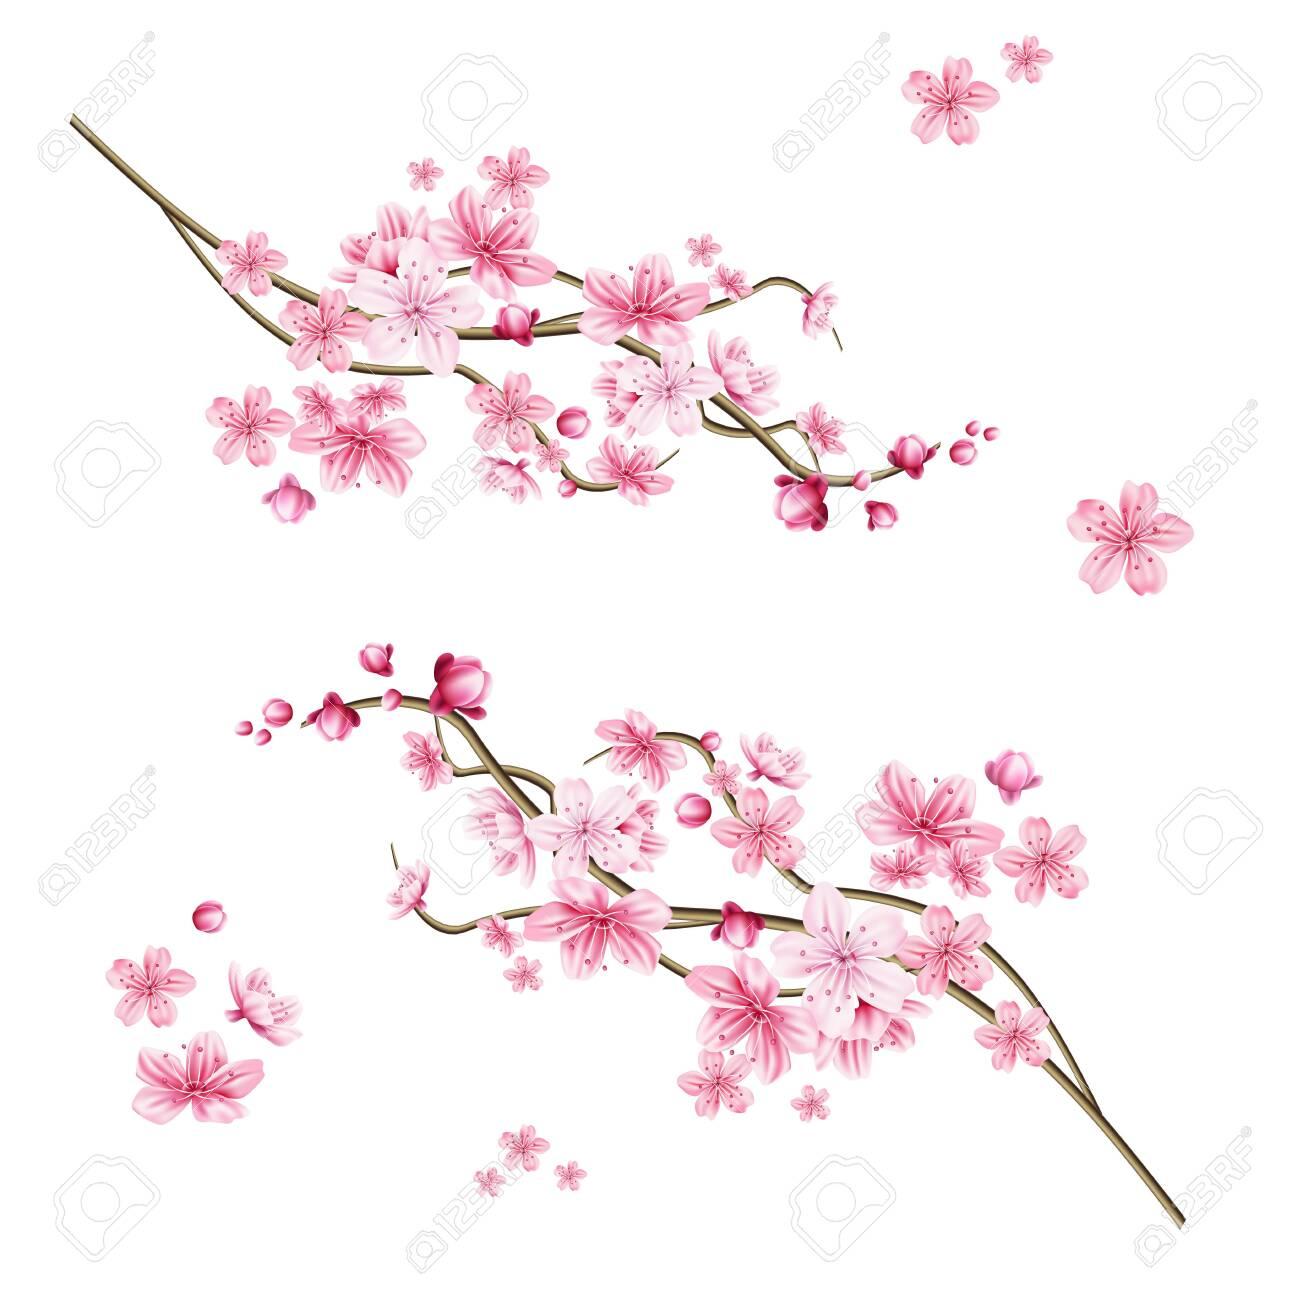 Realistic sakura tree branch. Elegant japanese symbol. Blooming plant twig with pink flower petals. Asian cultural symbol. Floral spring design decoration. Vector illustration. - 124511320